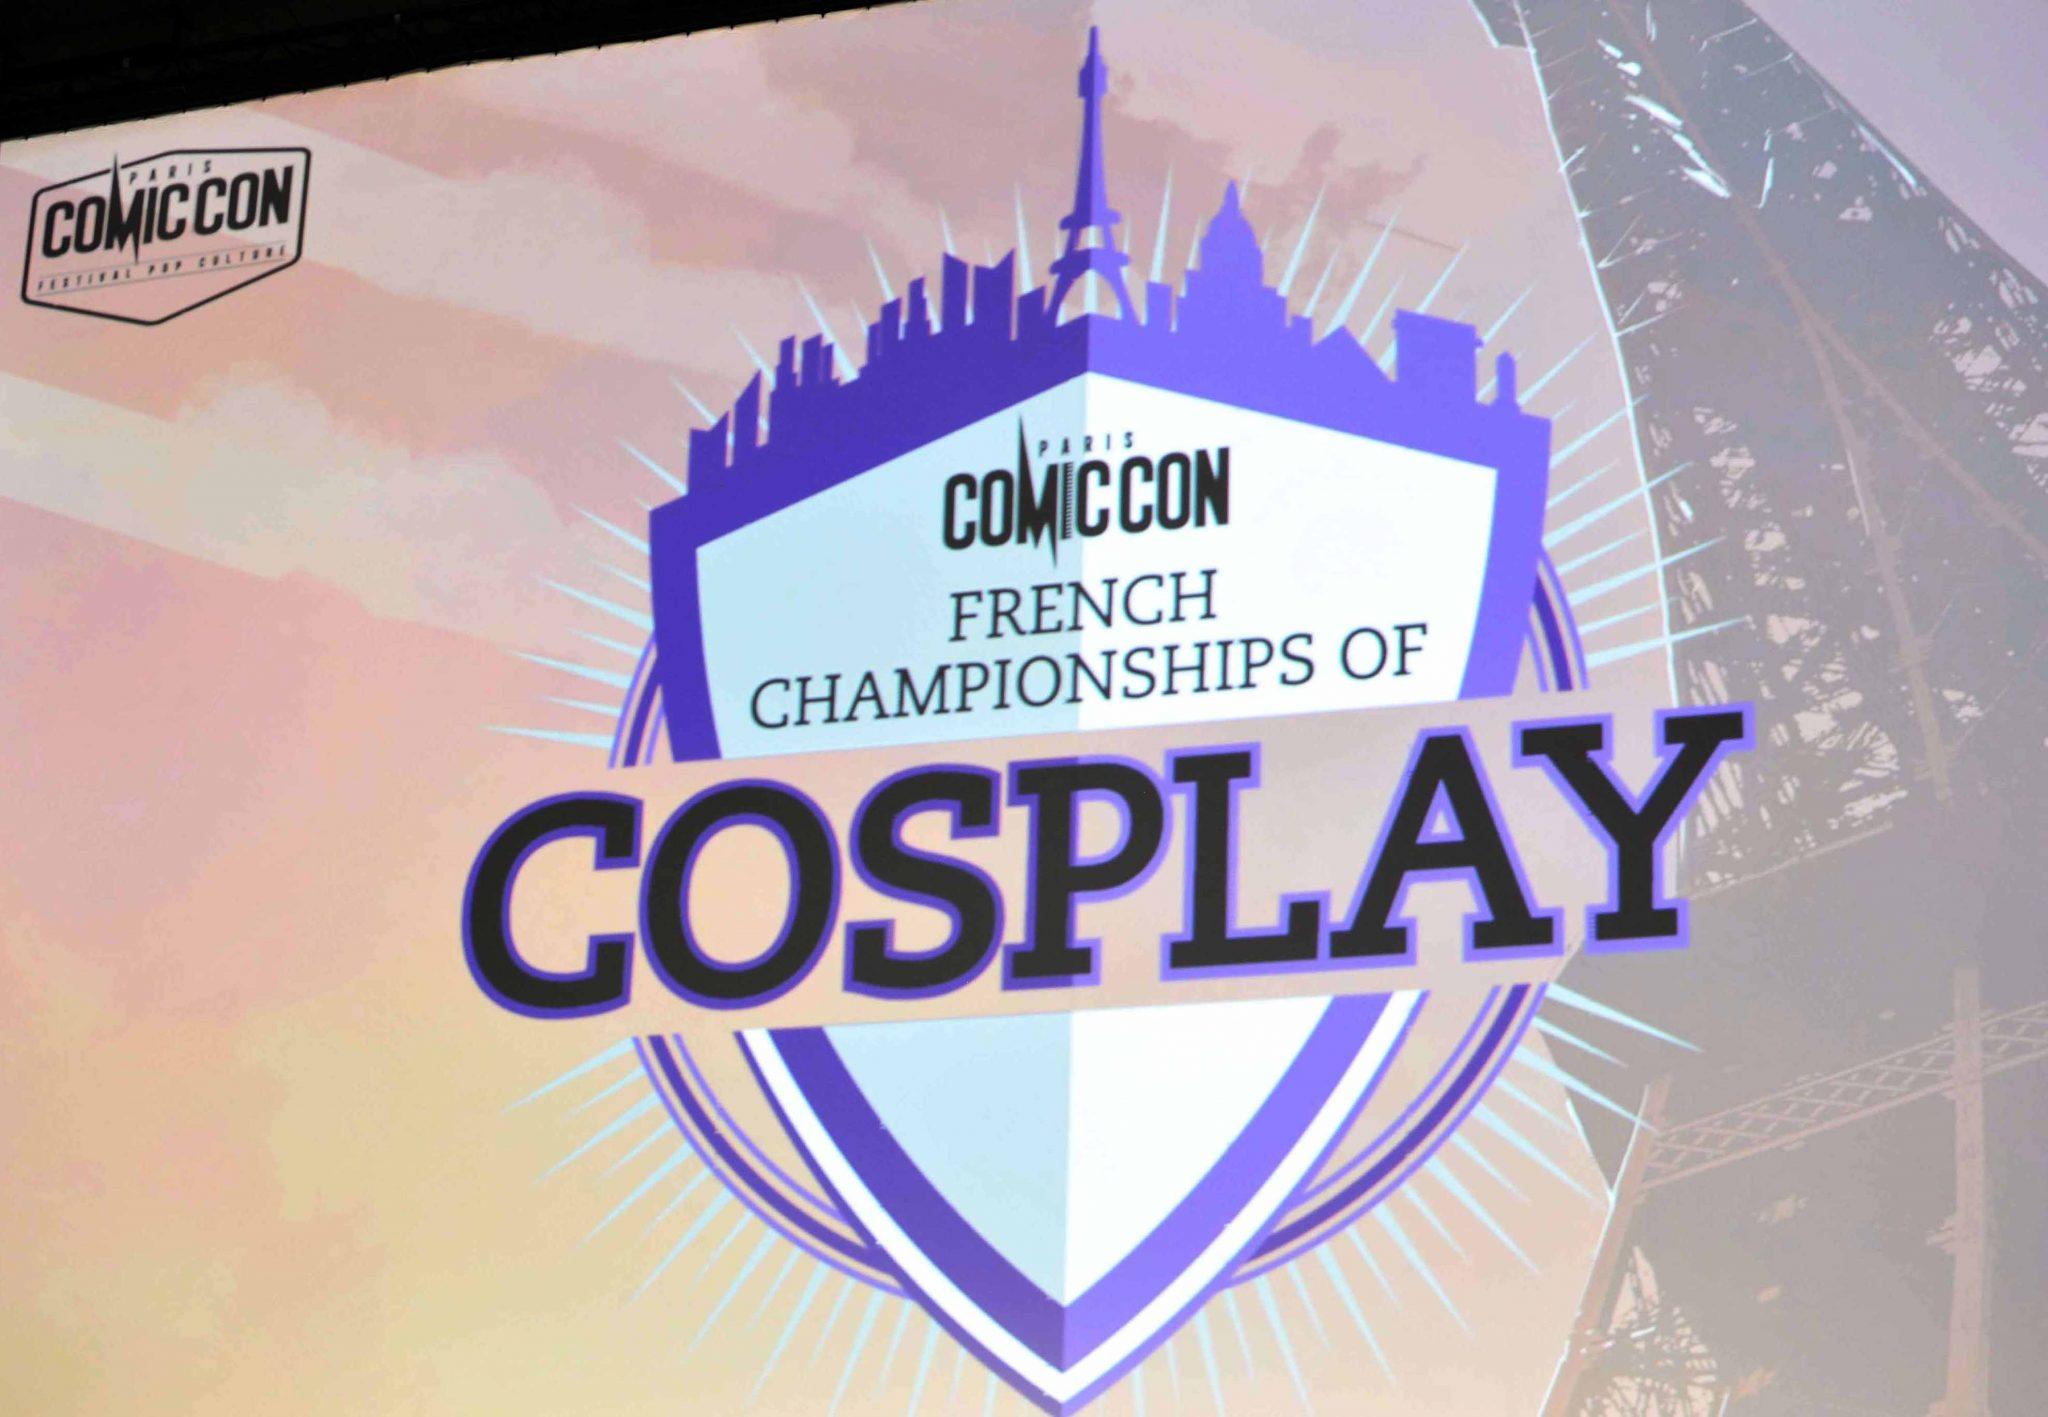 Comic Con Paris 2016 Cosplay